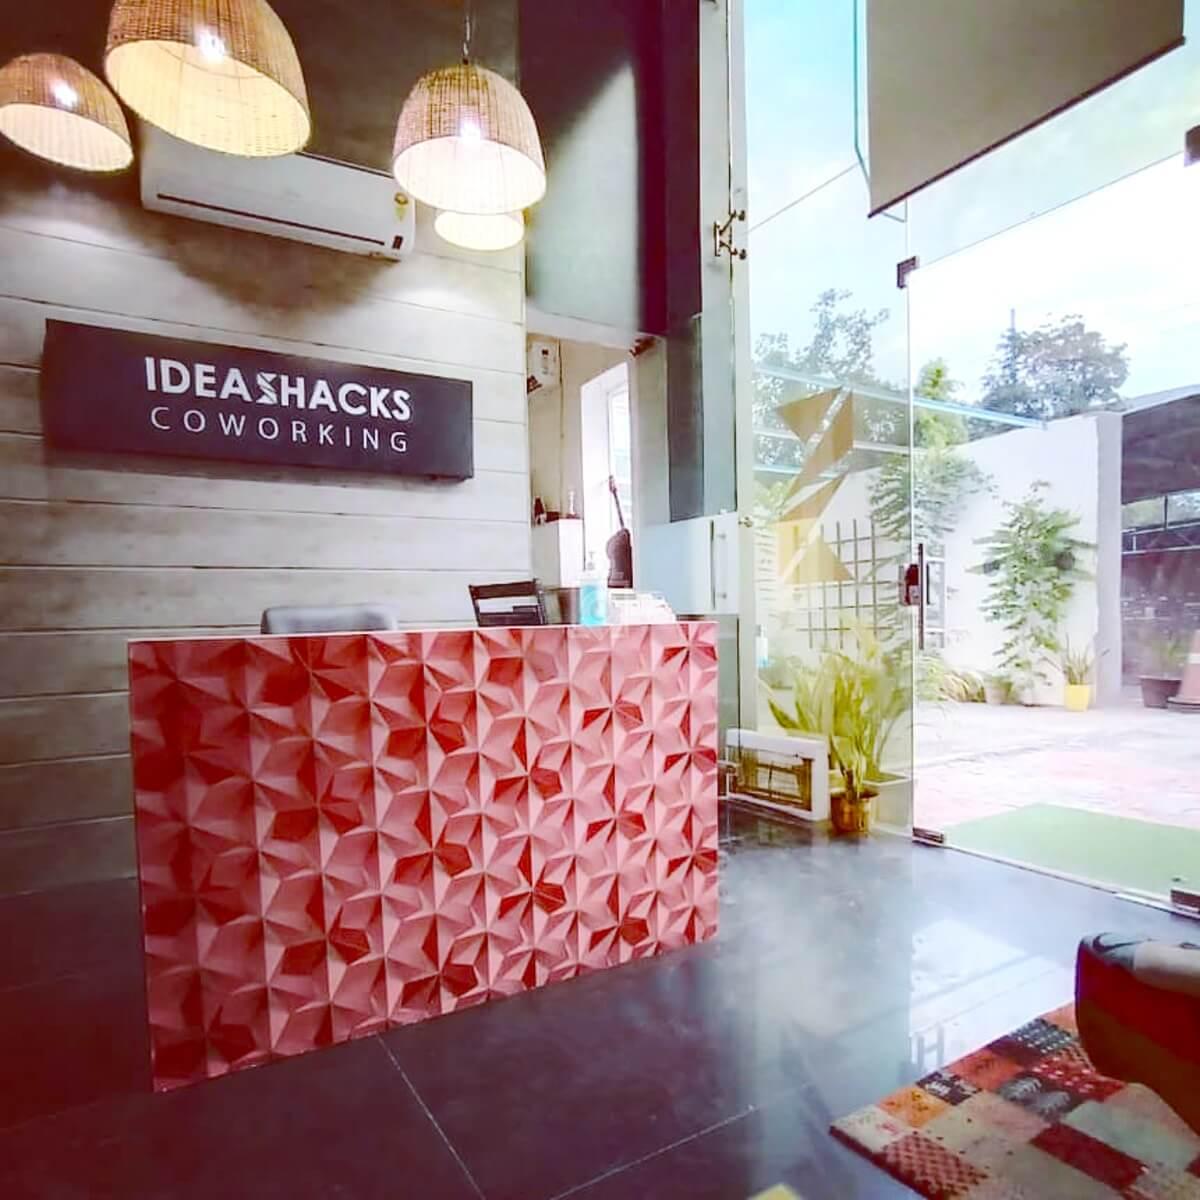 Ideashacks| Bookofficenow